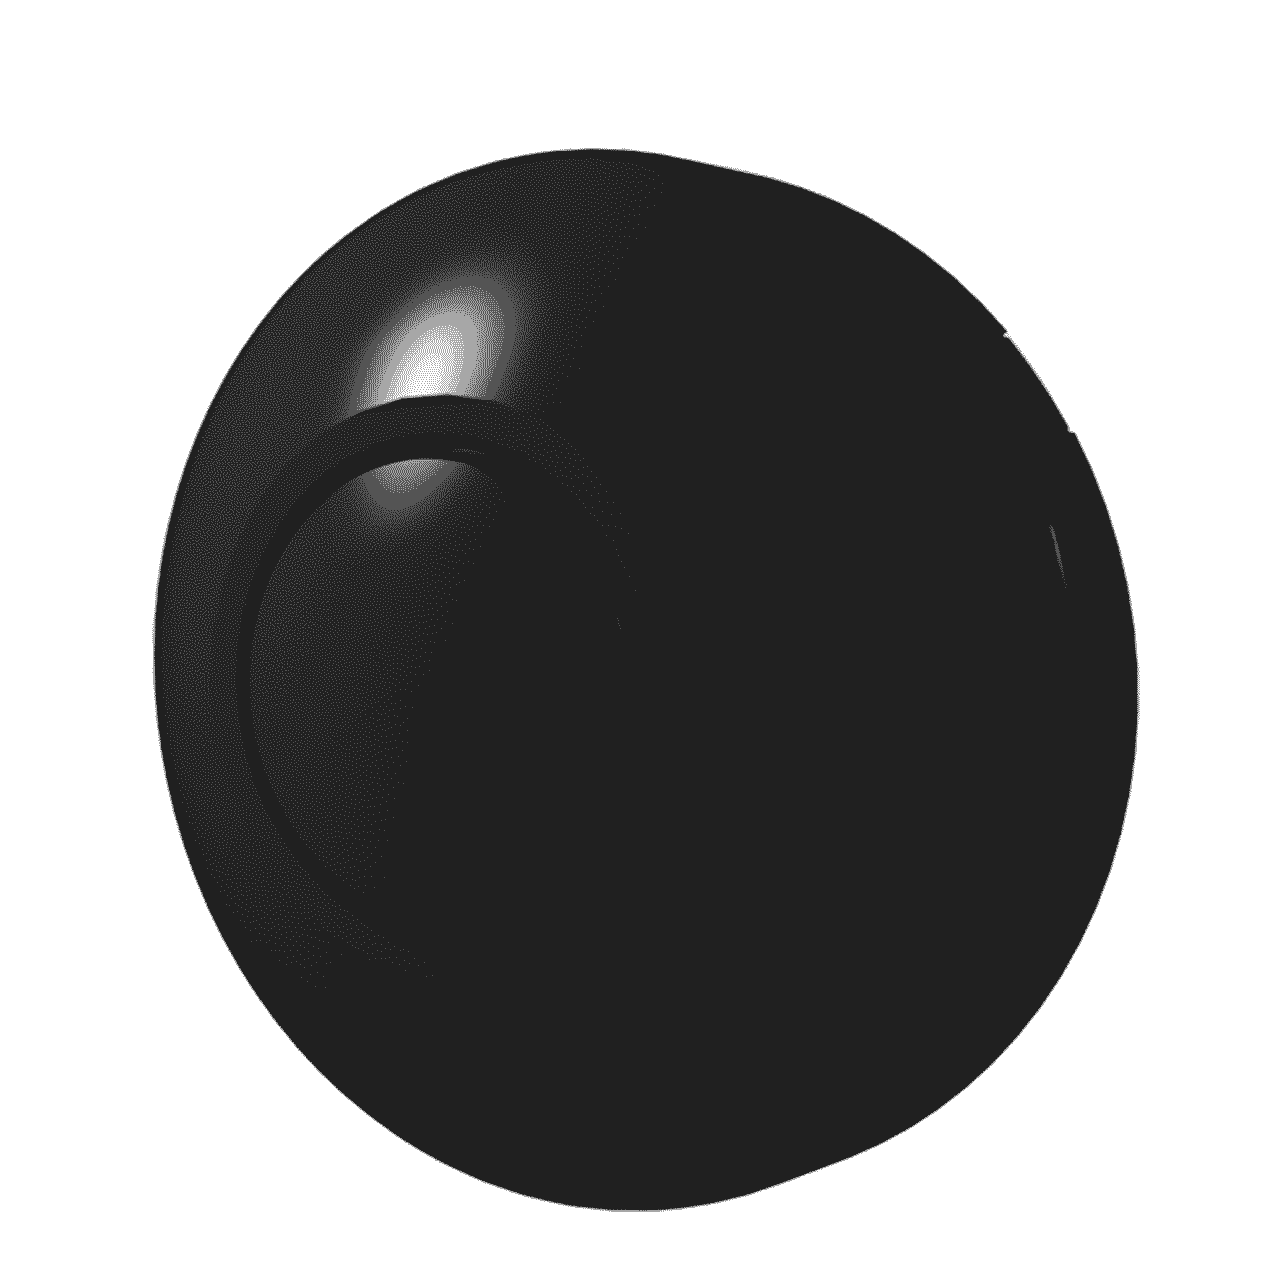 Vloerdimmer 0-50 watt zwart